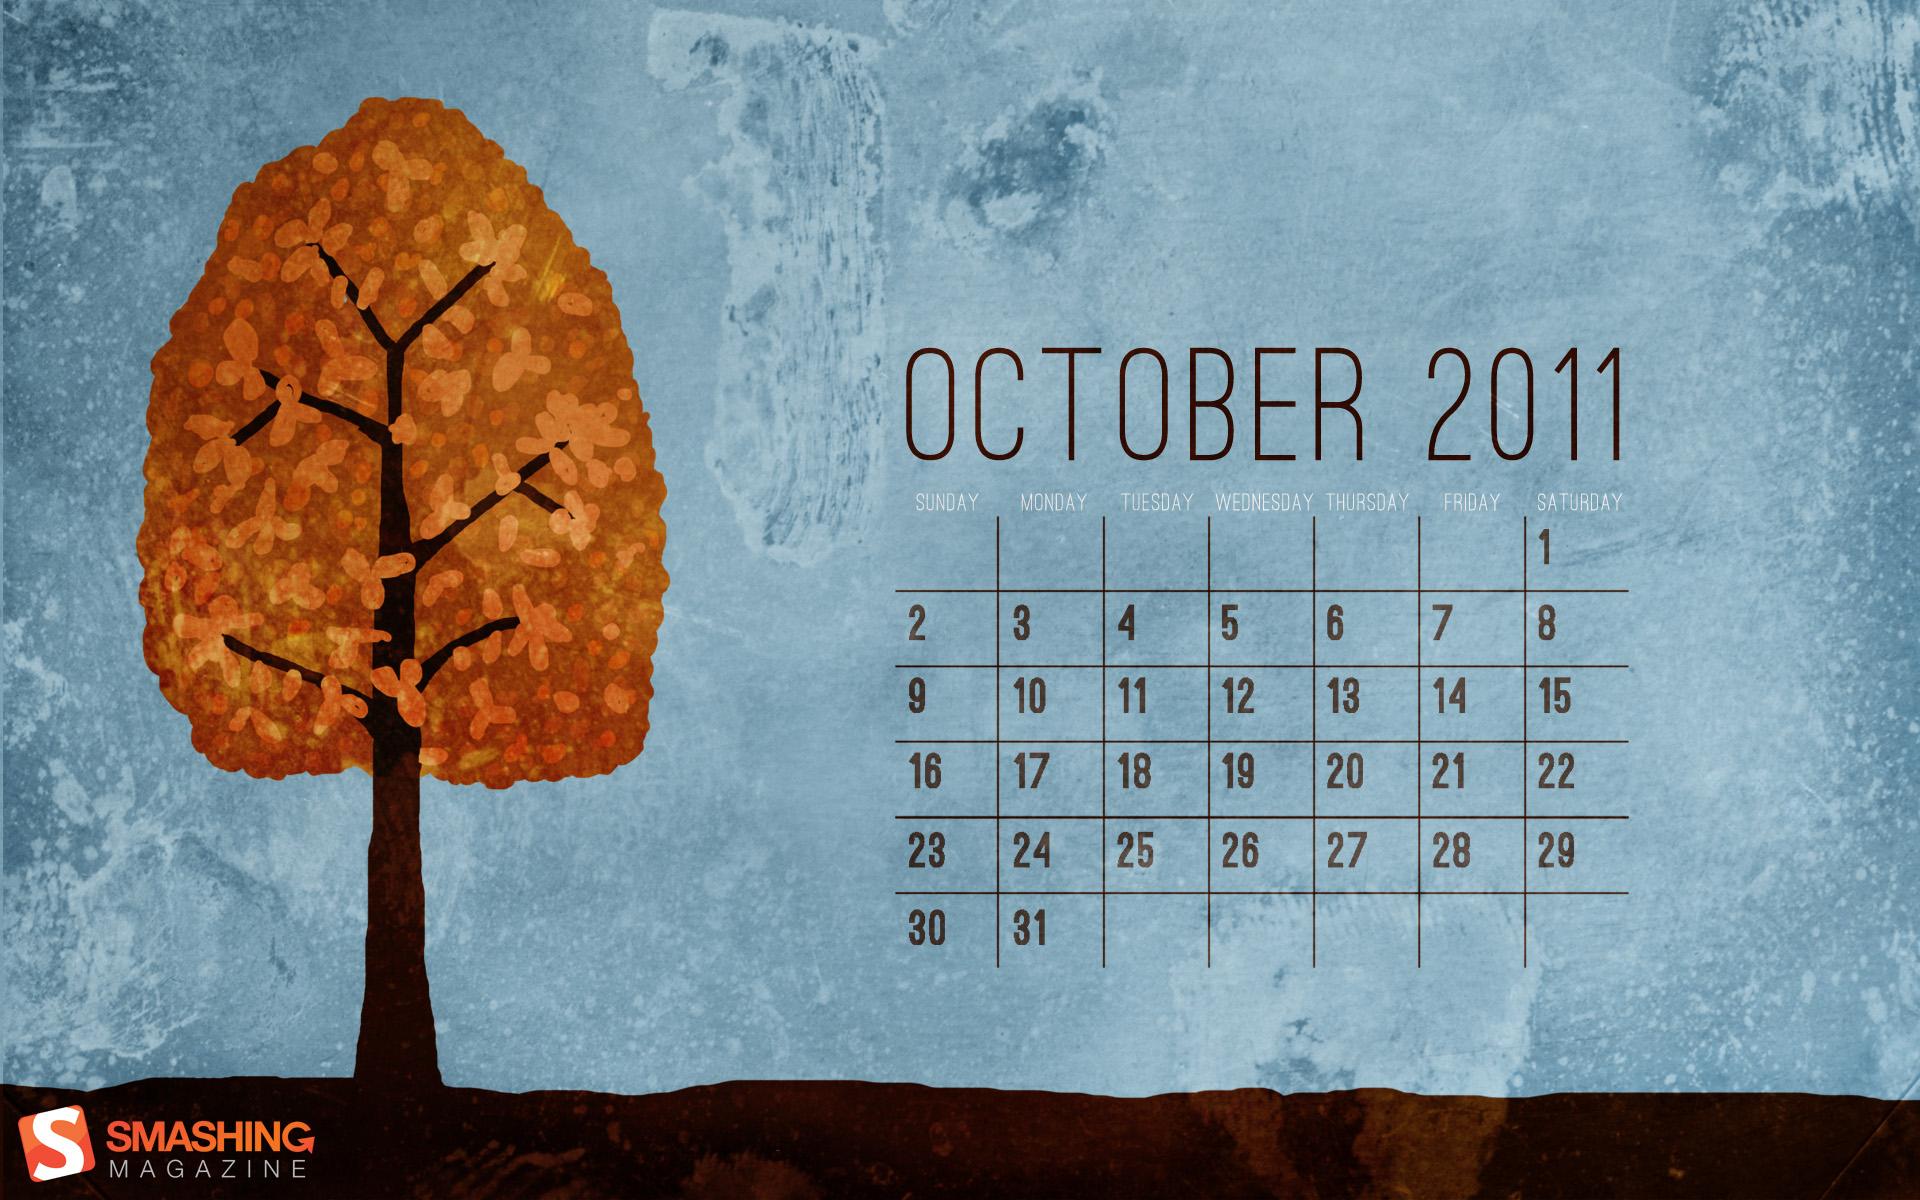 best photo essays 2012 calendar